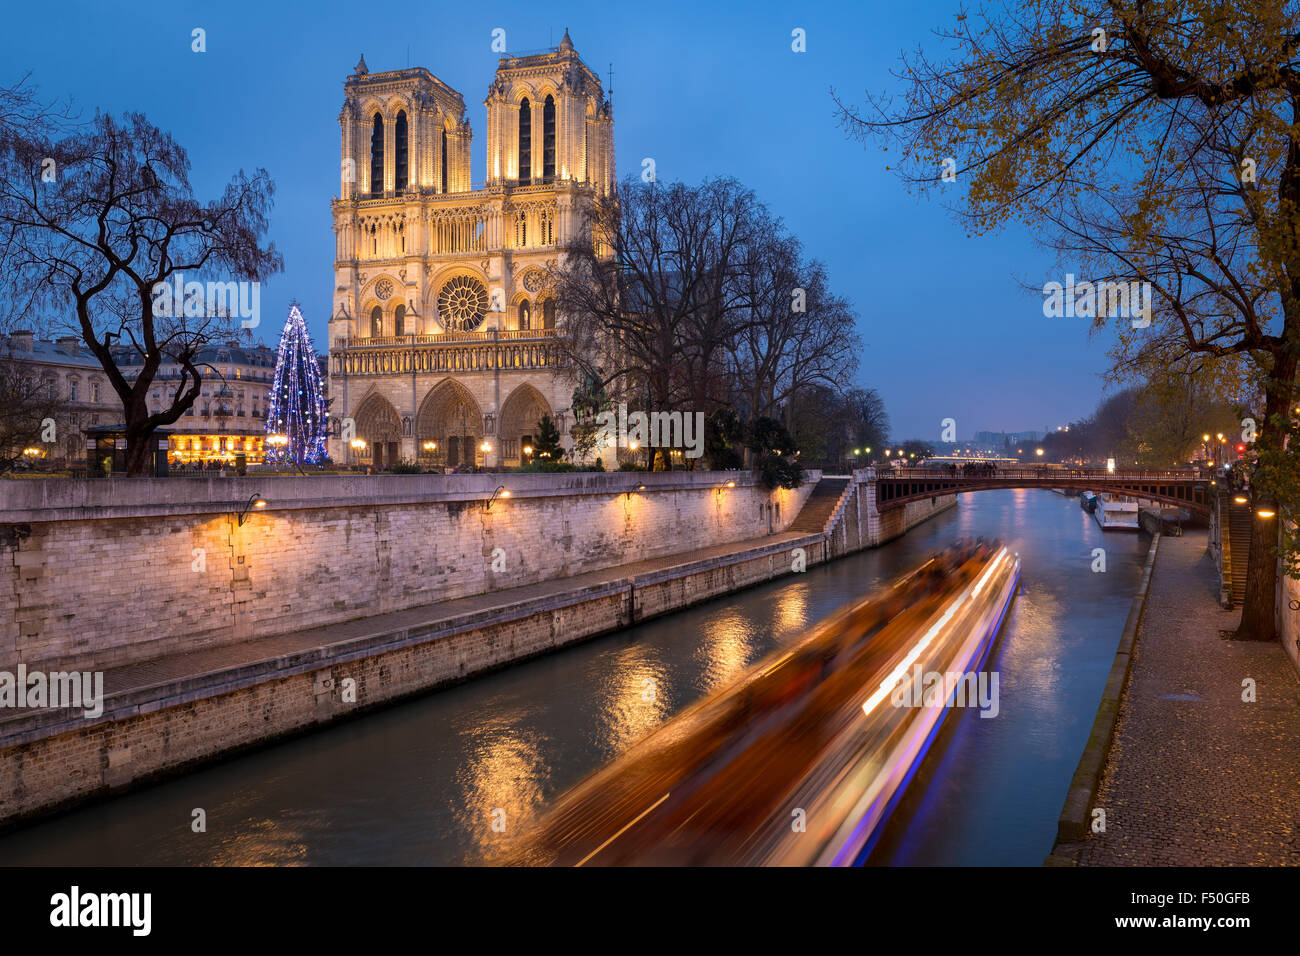 Kathedrale Notre Dame de Paris und Weihnachtsbaum Beleuchtung abends mit dem Seineufer, Ile De La Cite, Paris, Frankreich Stockbild